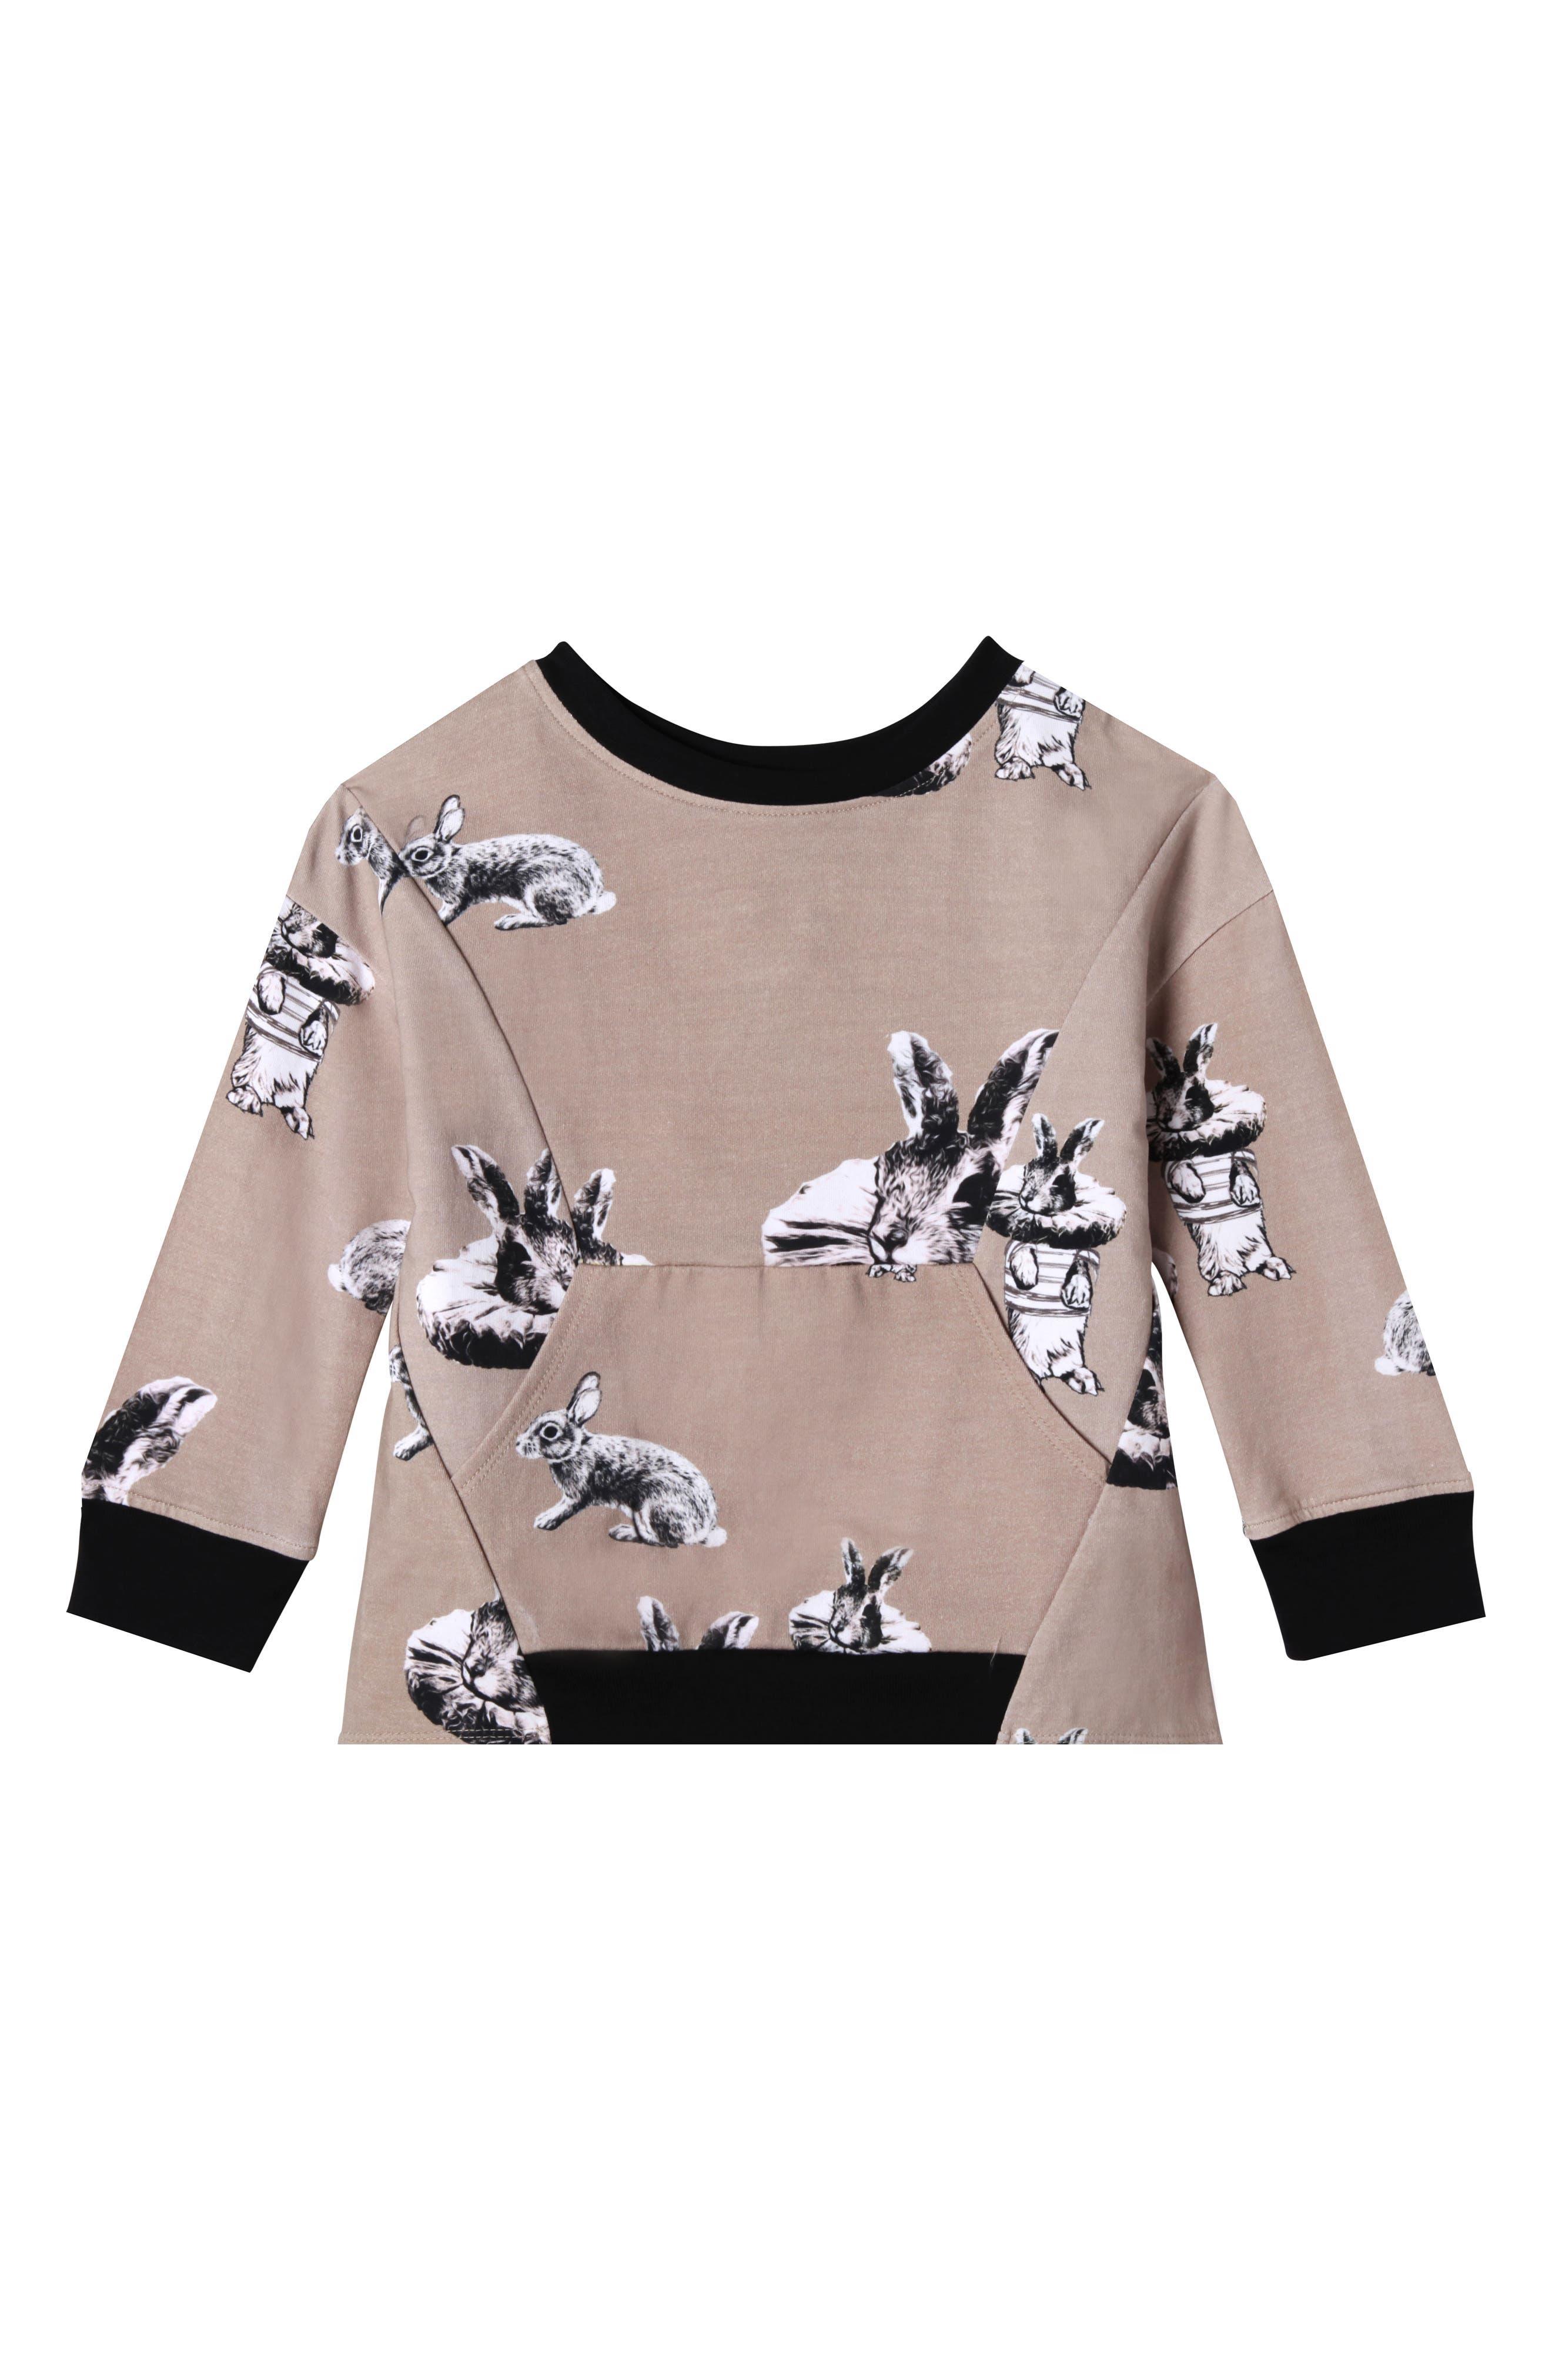 Art & Eden Amelia Sweatshirt (Toddler Girls & Little Girls)